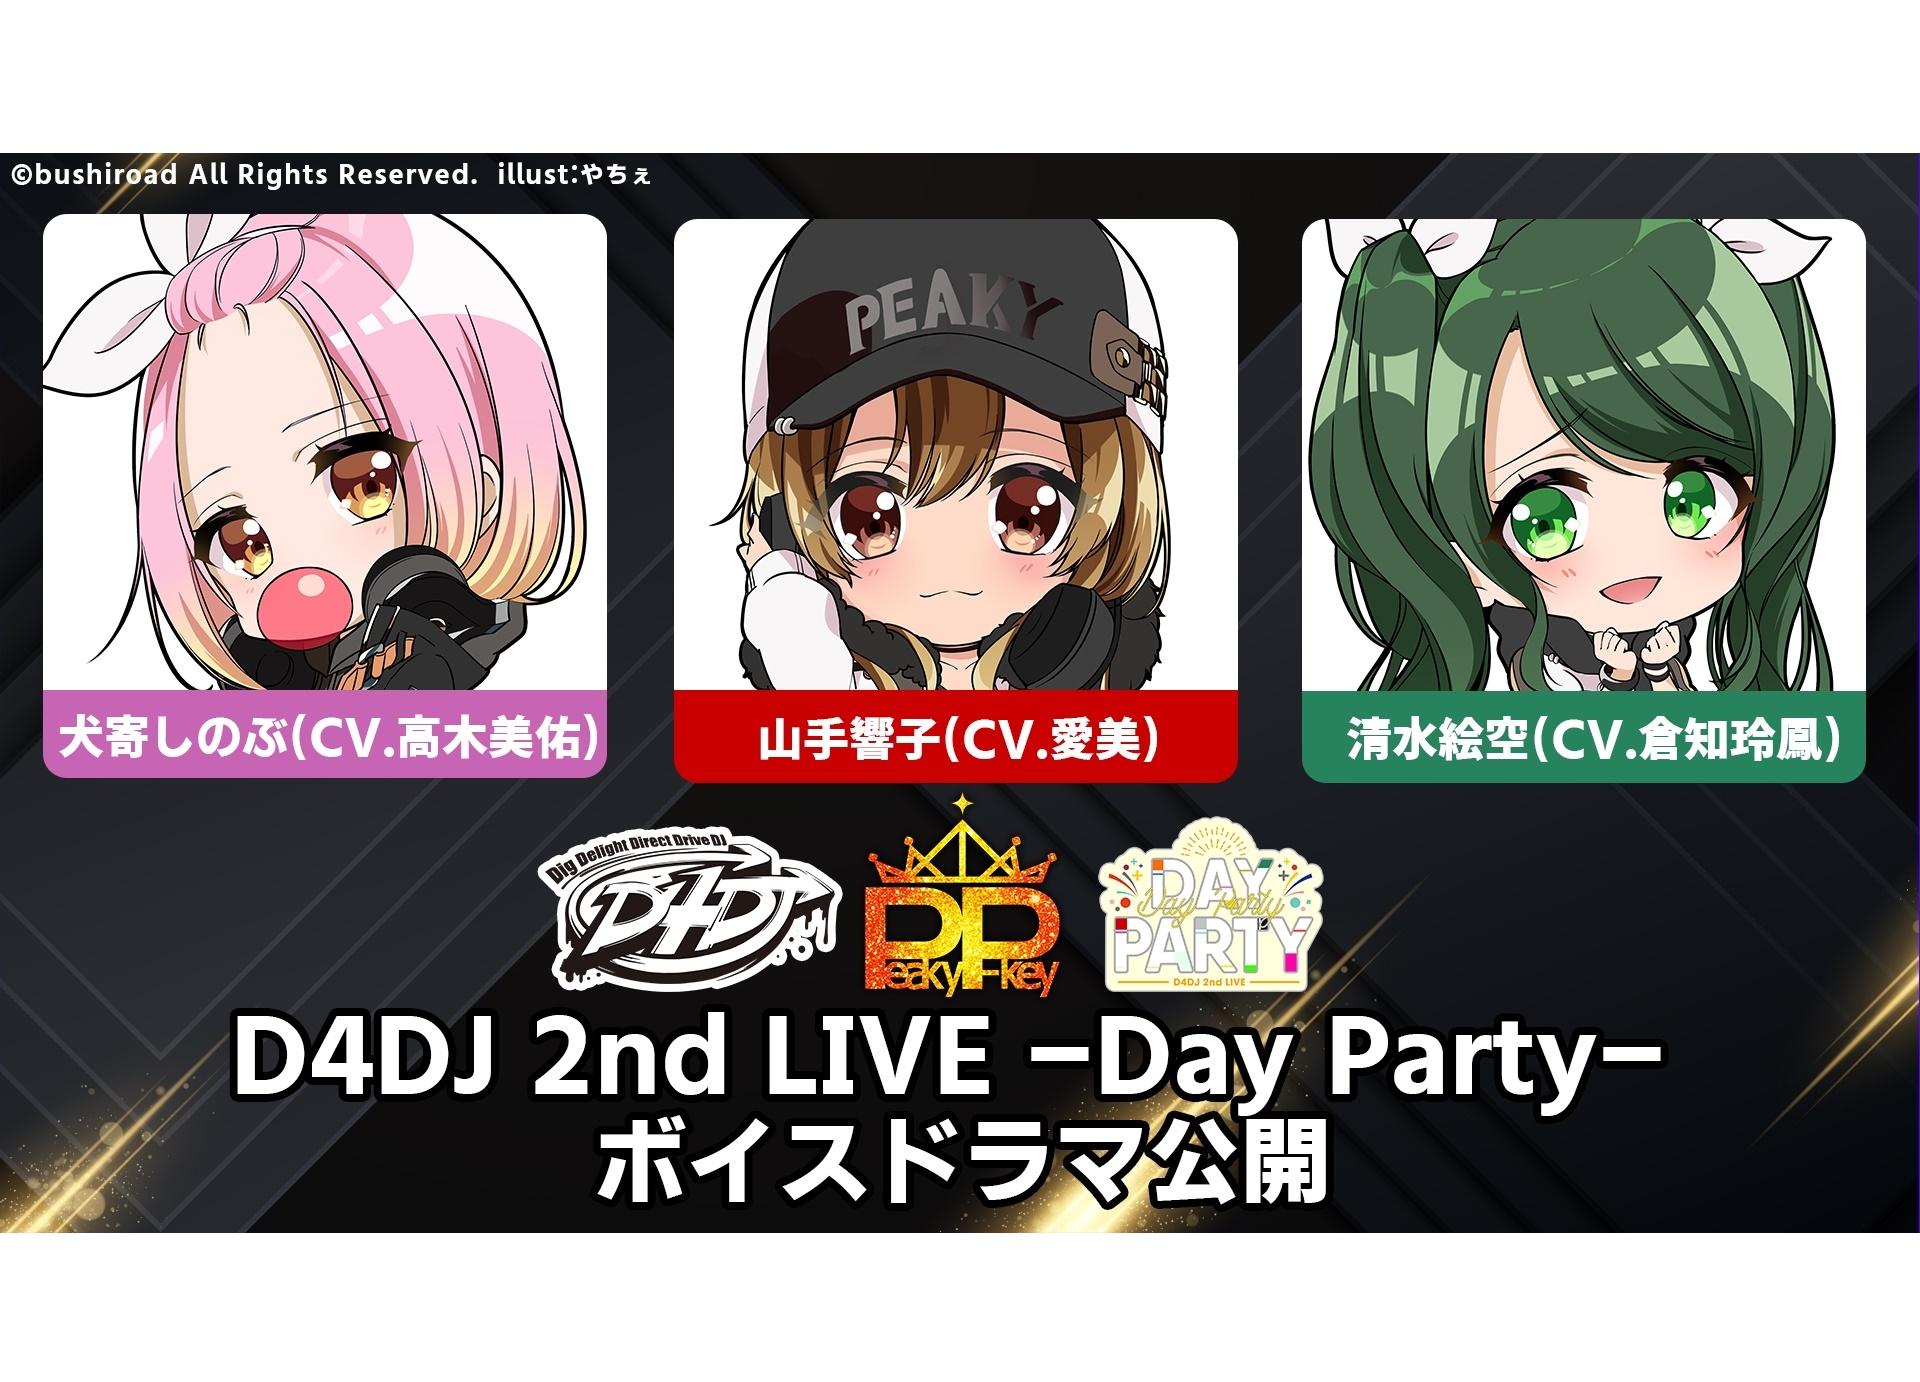 「D4DJ 2nd LIVE Peaky P-key ミニボイスドラマ」公開